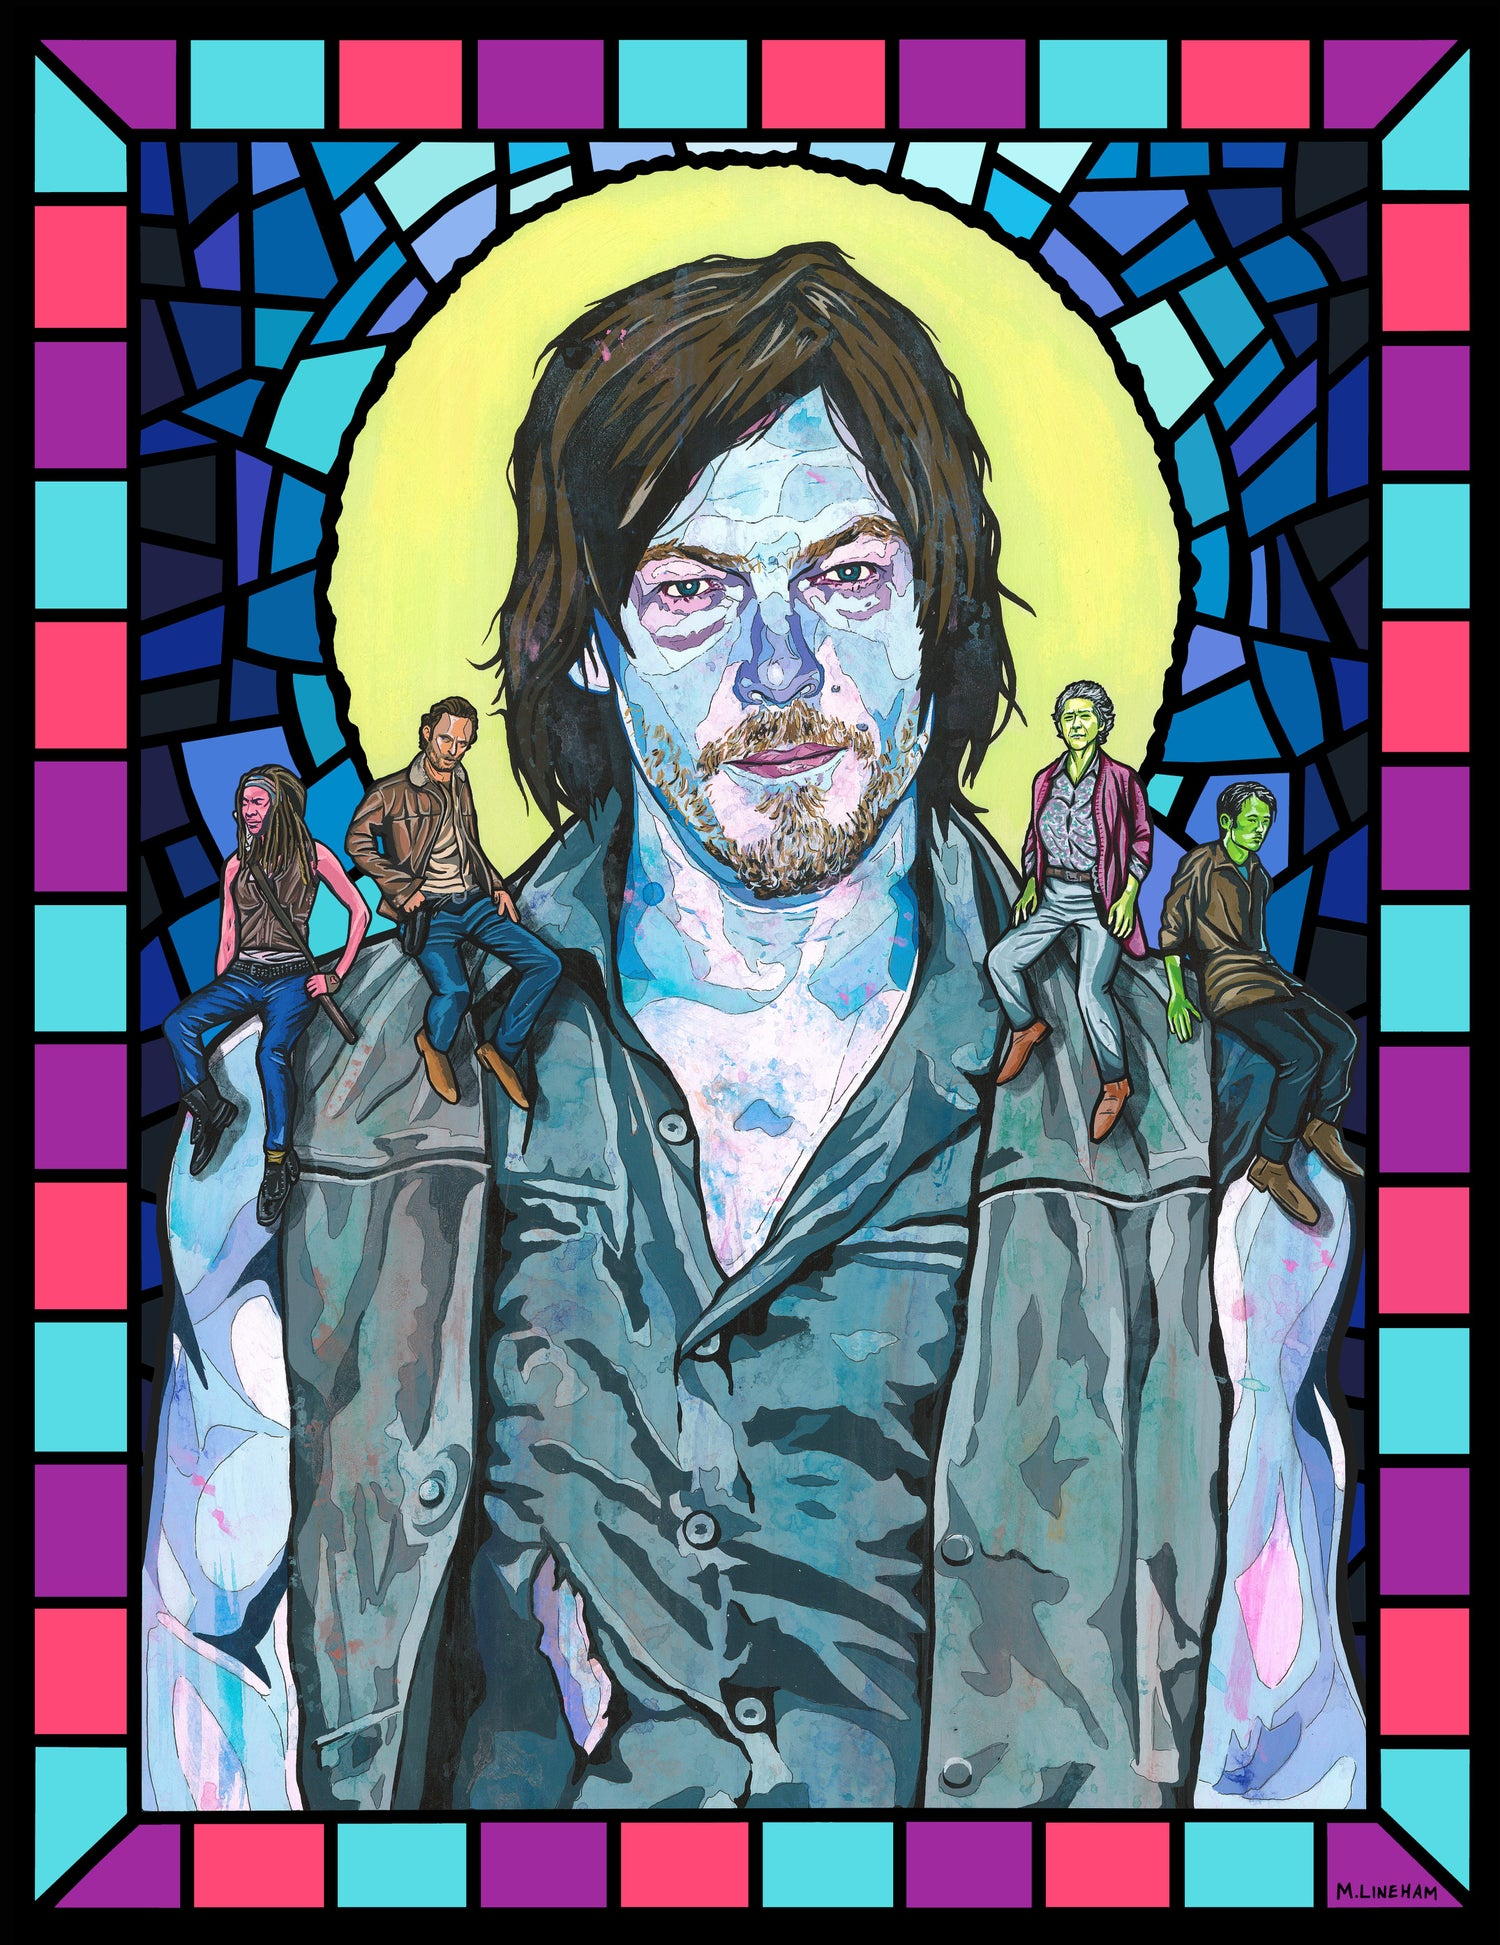 Image of Saint Daryl Dixon (The Walking Dead)